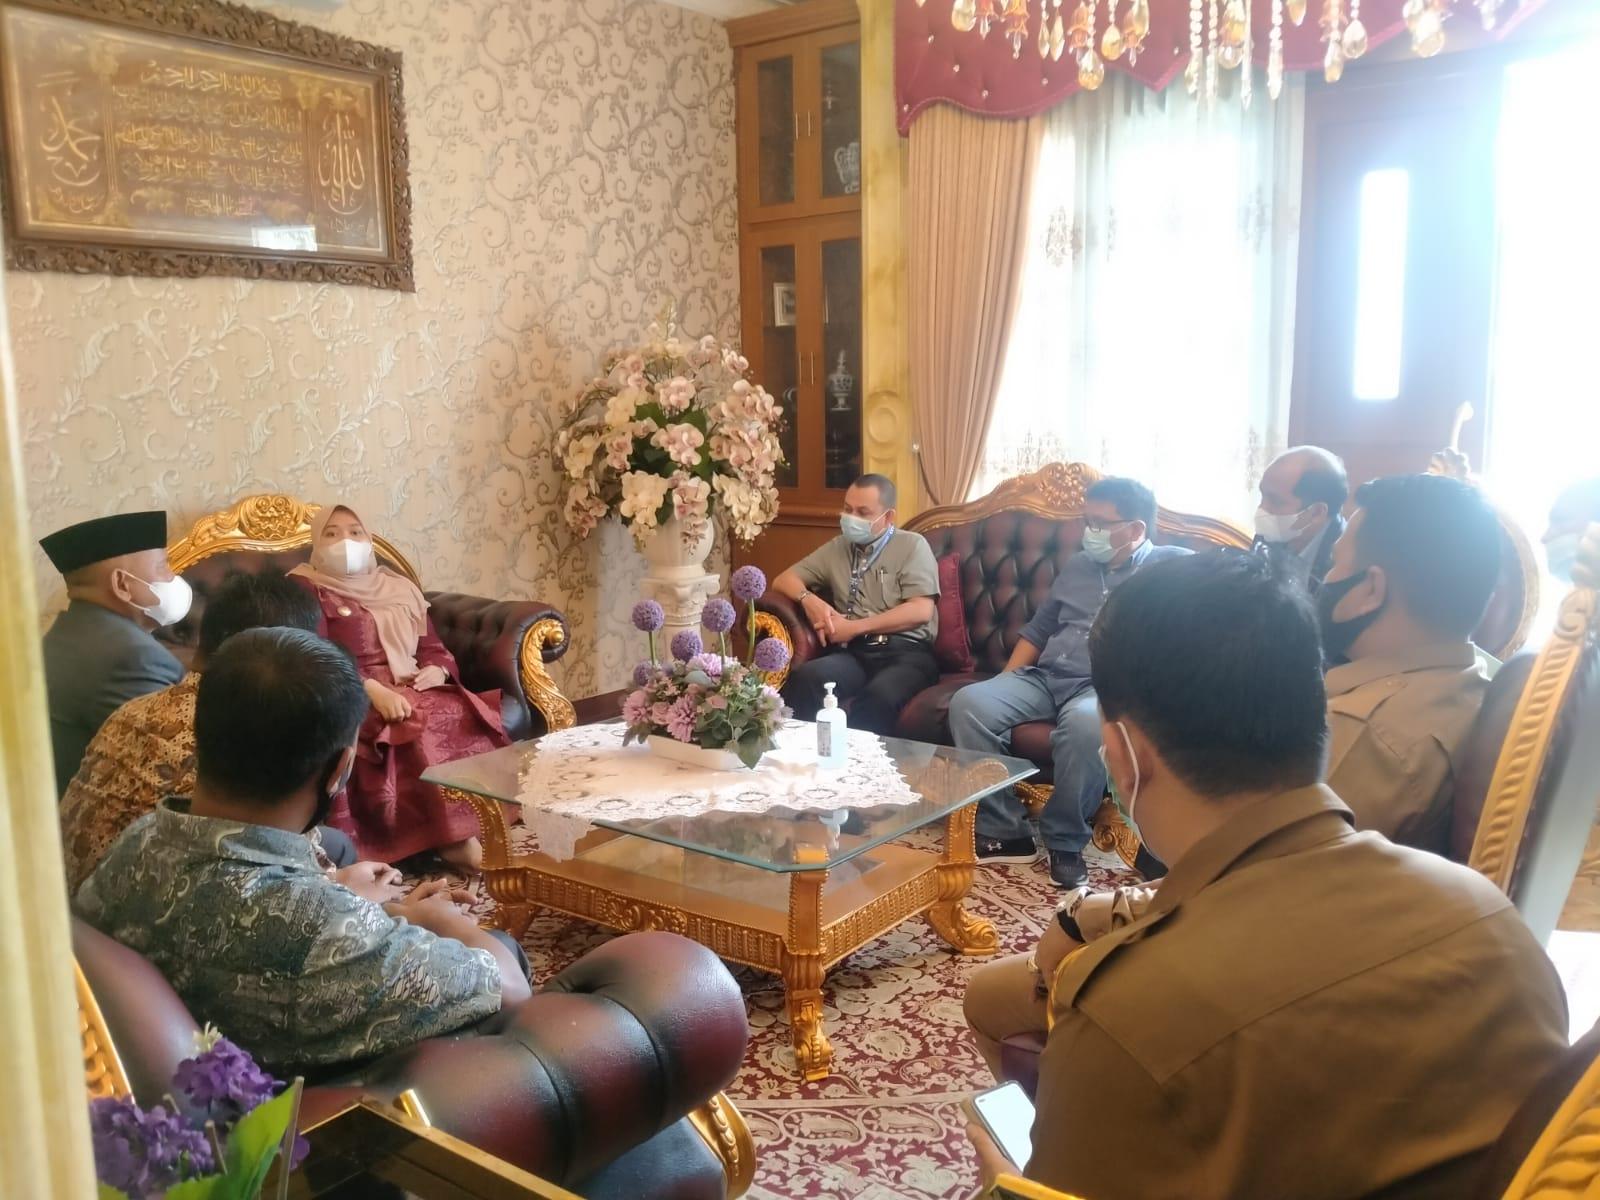 Bupati Muaro Jambi, Hj Masnah Busro SE mendapat kunjungan silaturahmi dari PTPN VI di Kediamannya hari ini, Senin (19/03/2021).